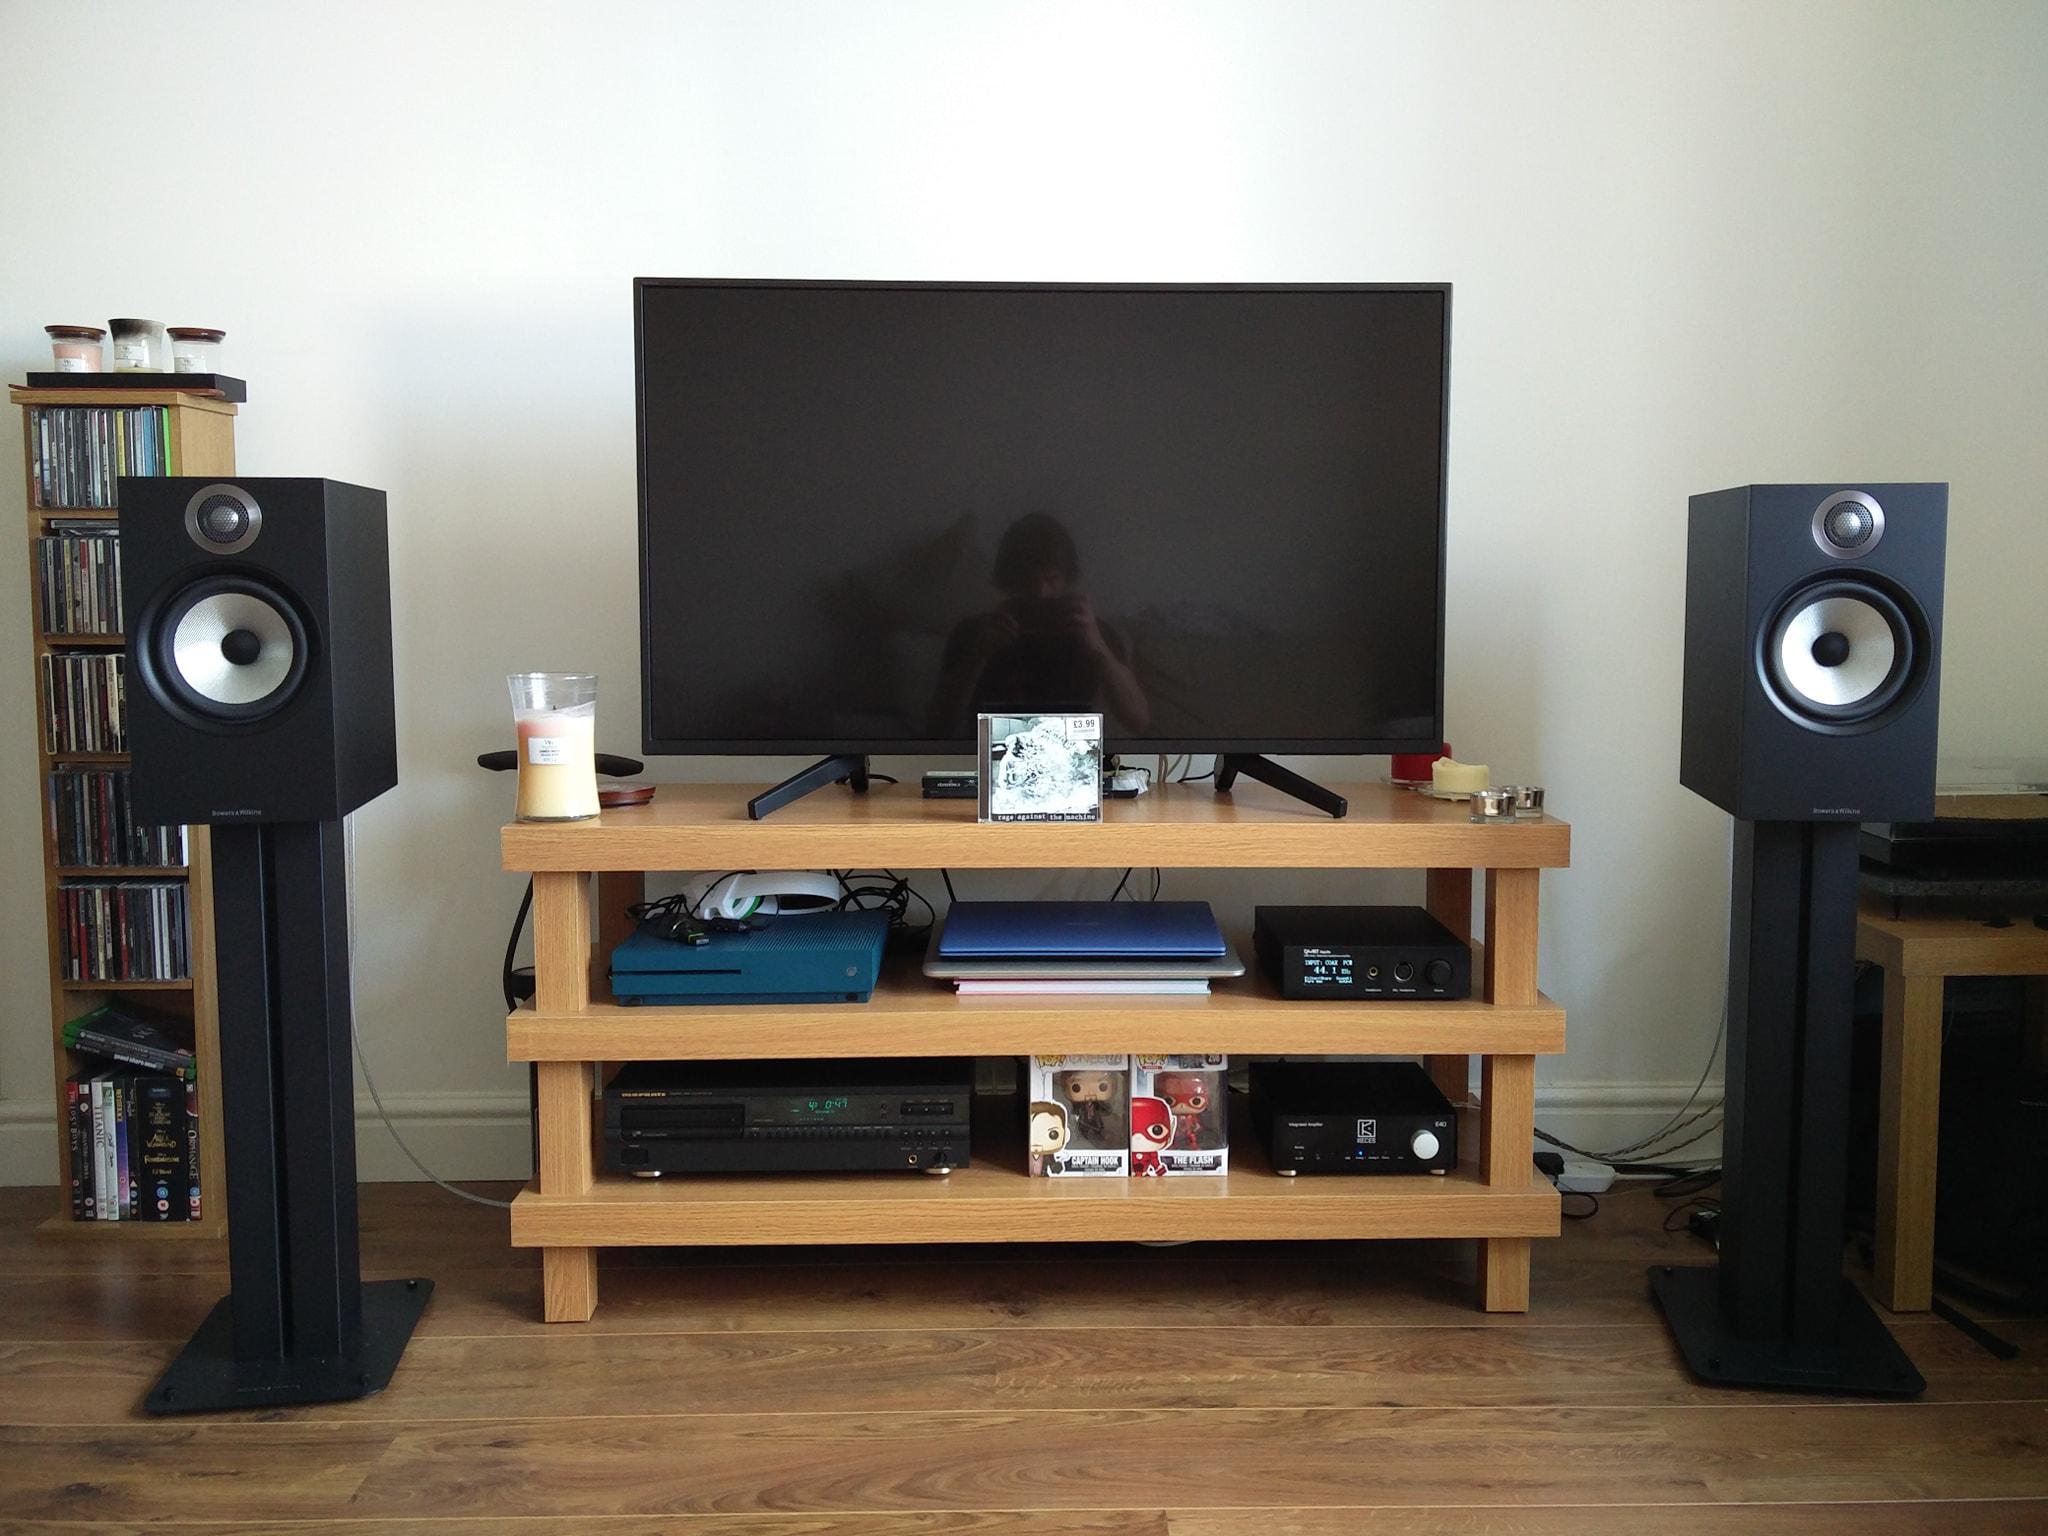 Need advice on speaker - running in circles | Headphone